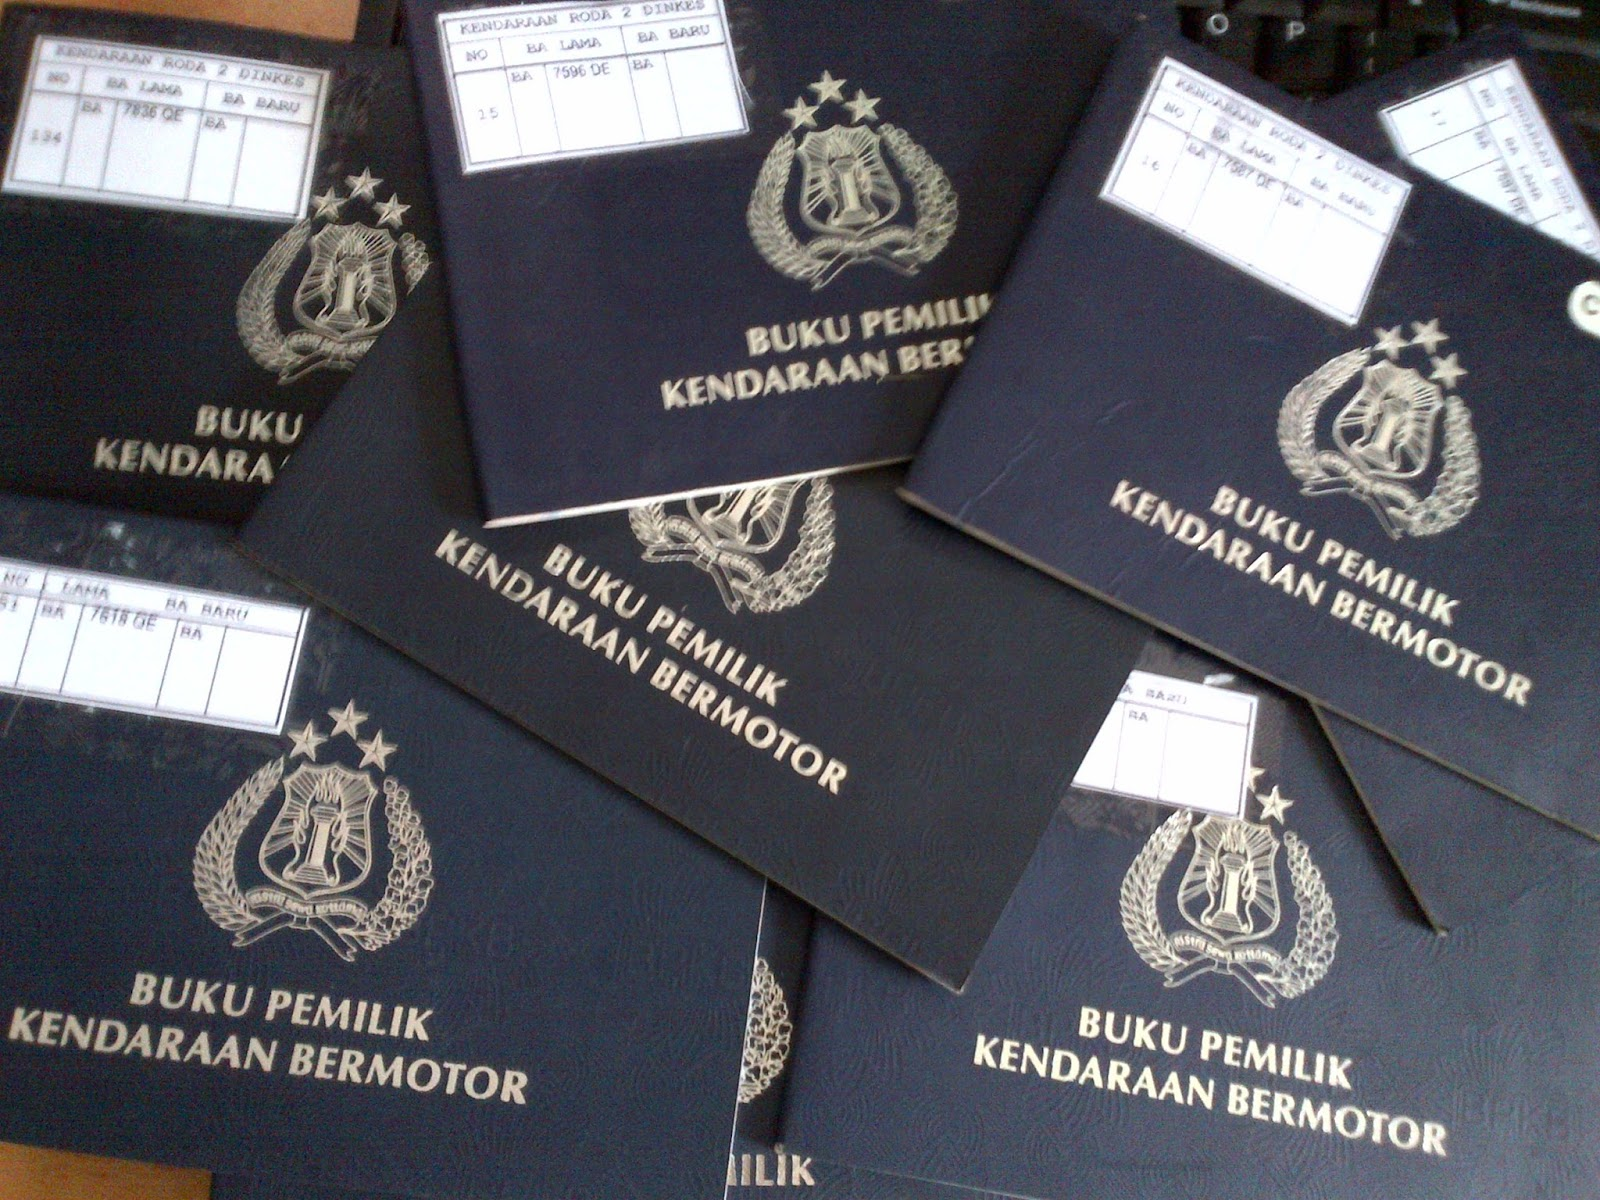 Samsat Jakarta Online: KETENTUAN BALIK NAMA, STNK/BPKB